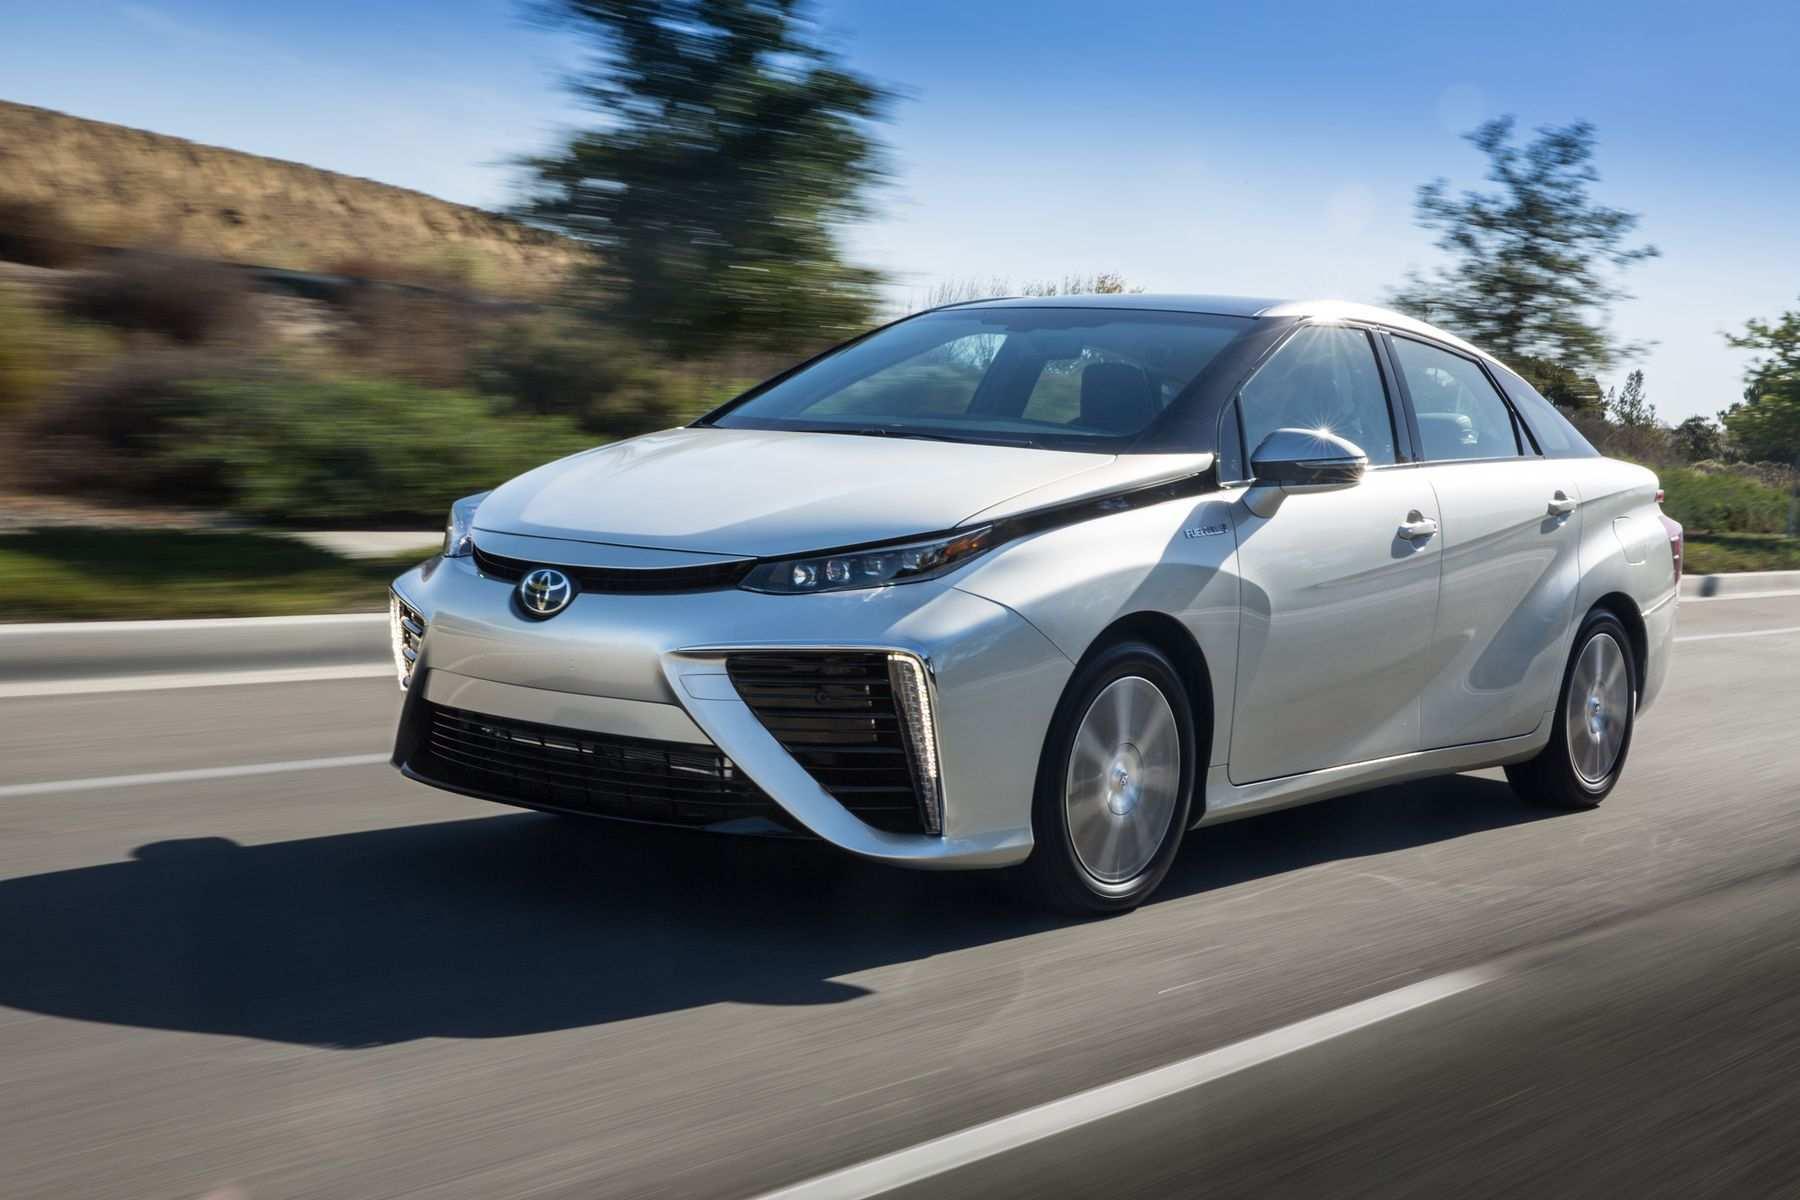 44 The Toyota Mirai 2020 Spesification with Toyota Mirai 2020